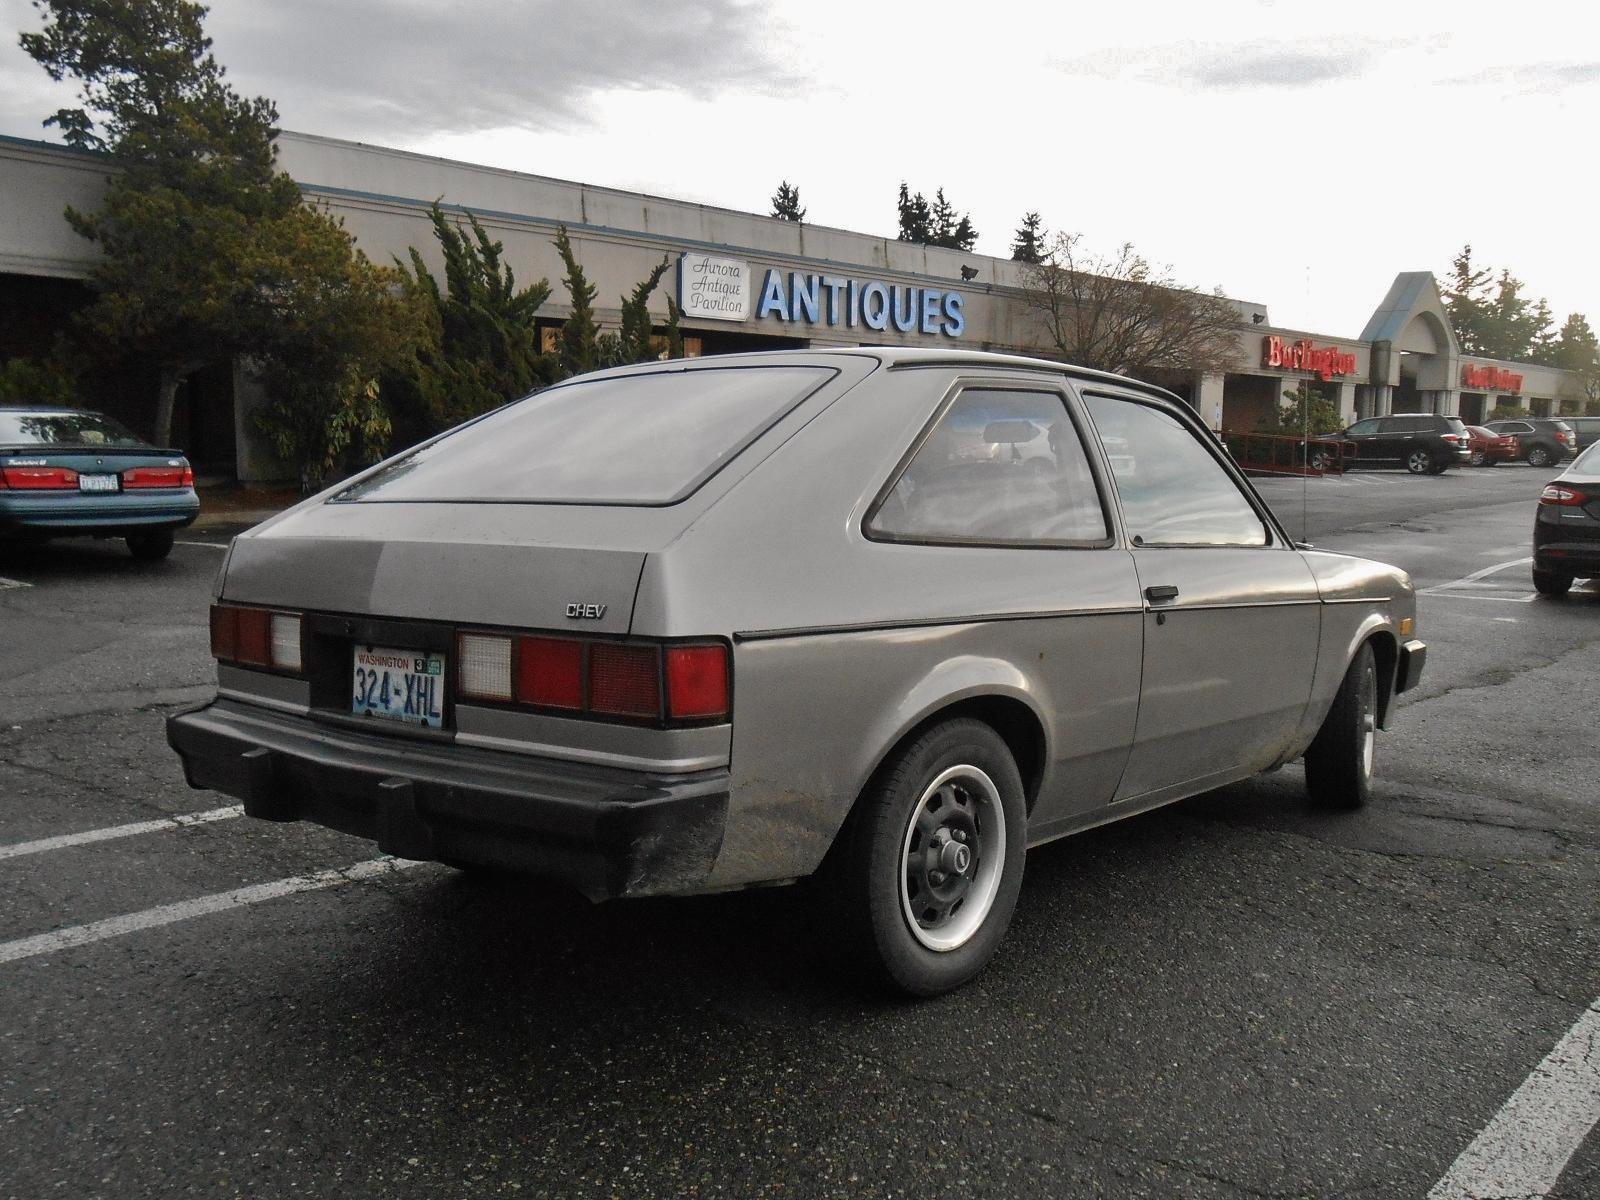 Seattle's Parked Cars: 1983 Chevrolet Chevette